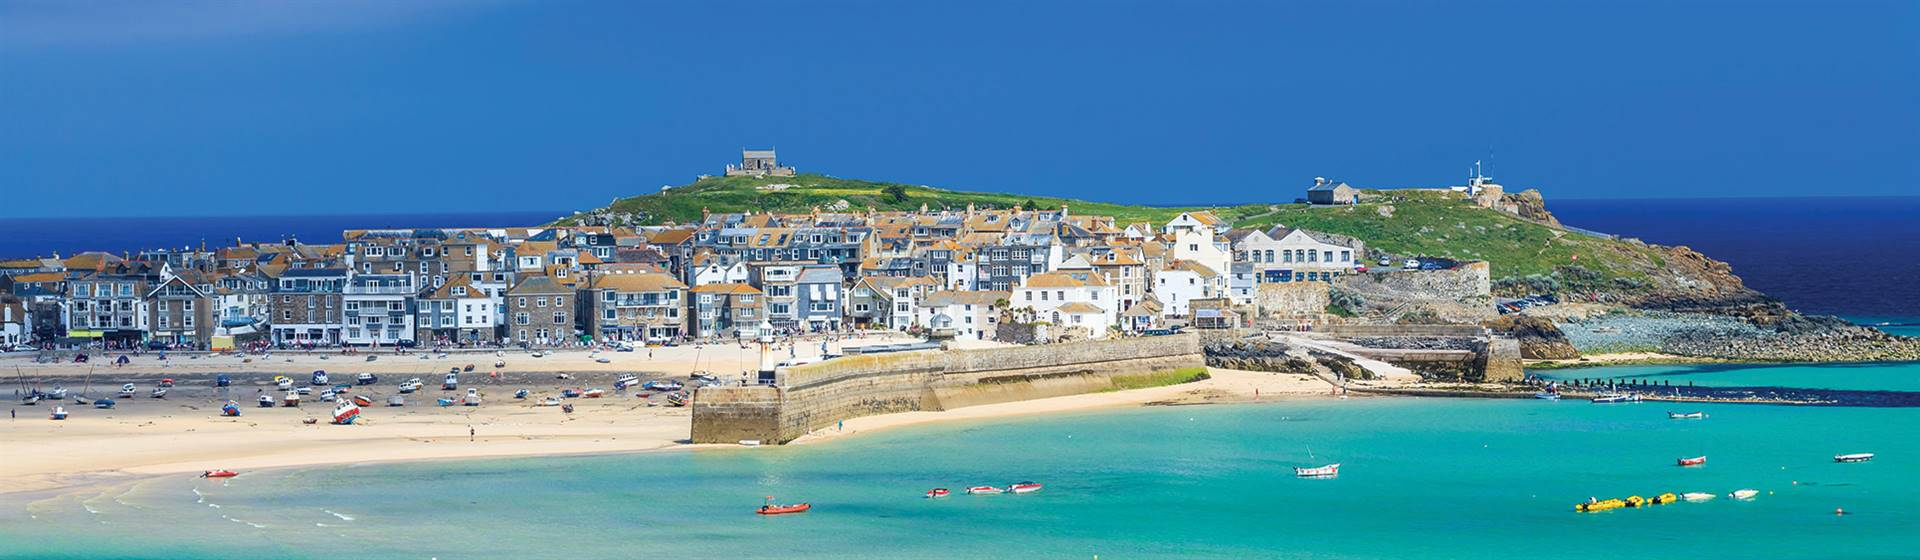 Cornish Highlights Ft Rosemundy House Hotel 2022